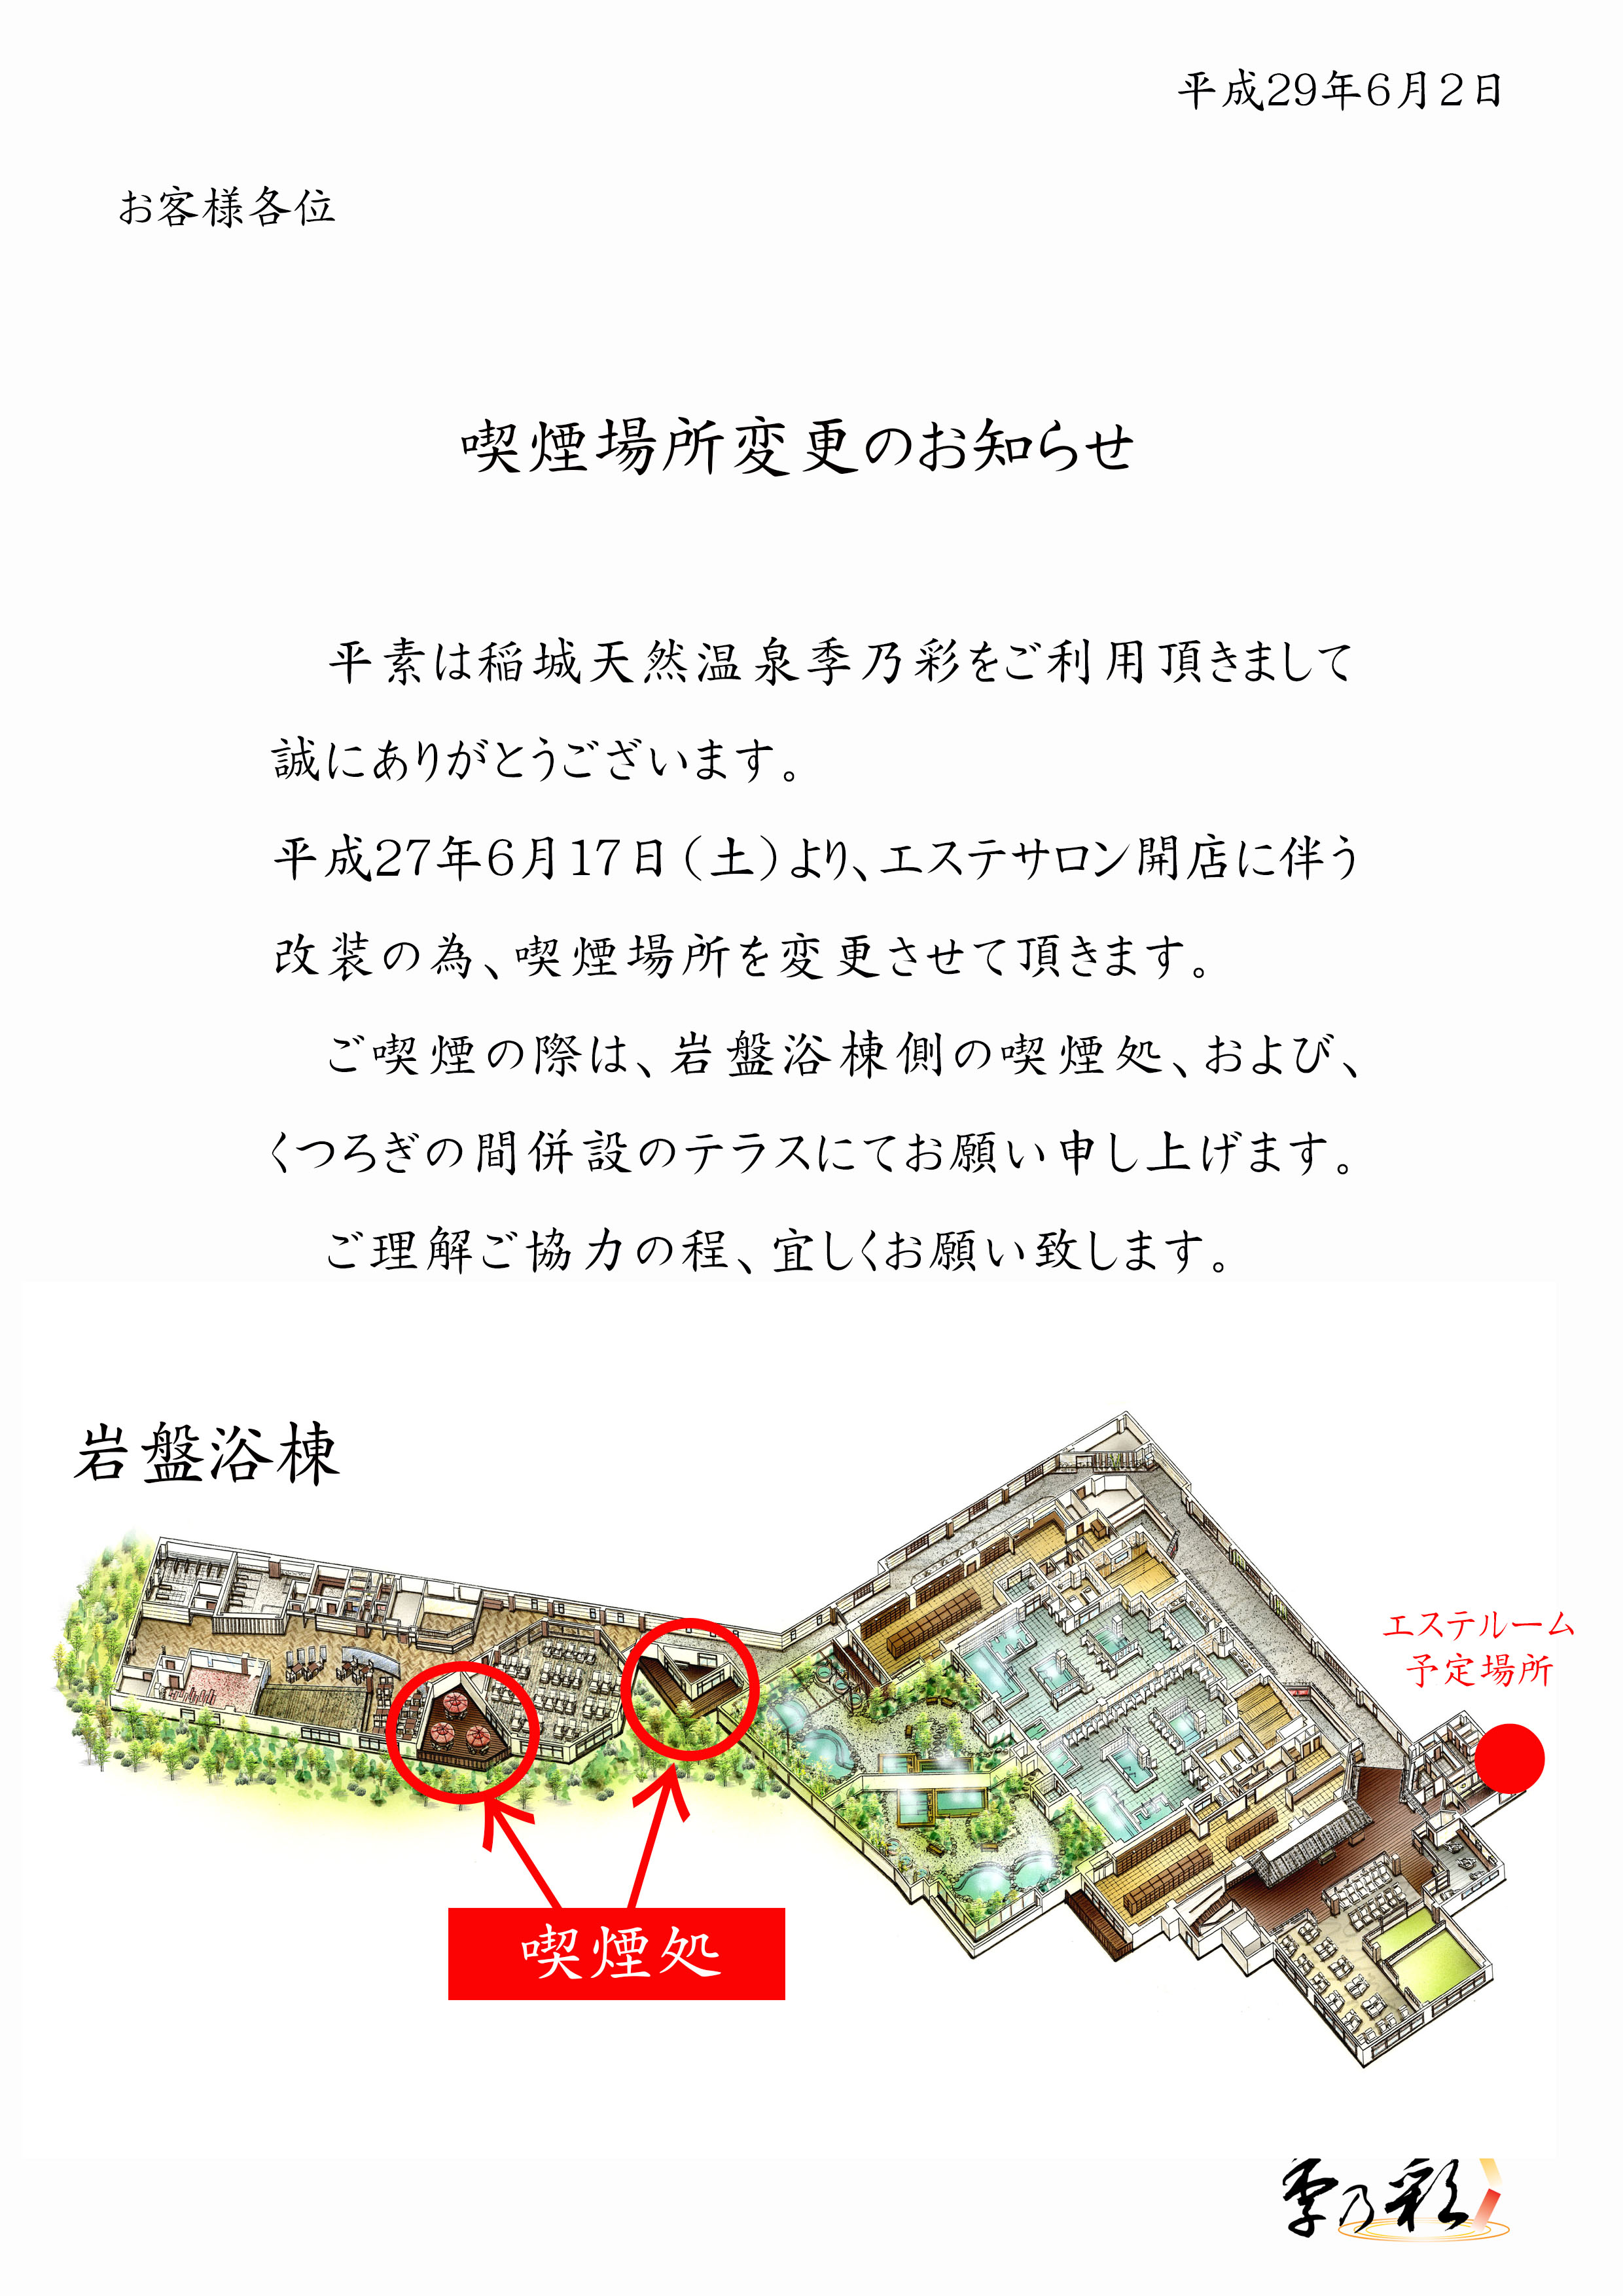 POP お知らせ 喫煙所移動02